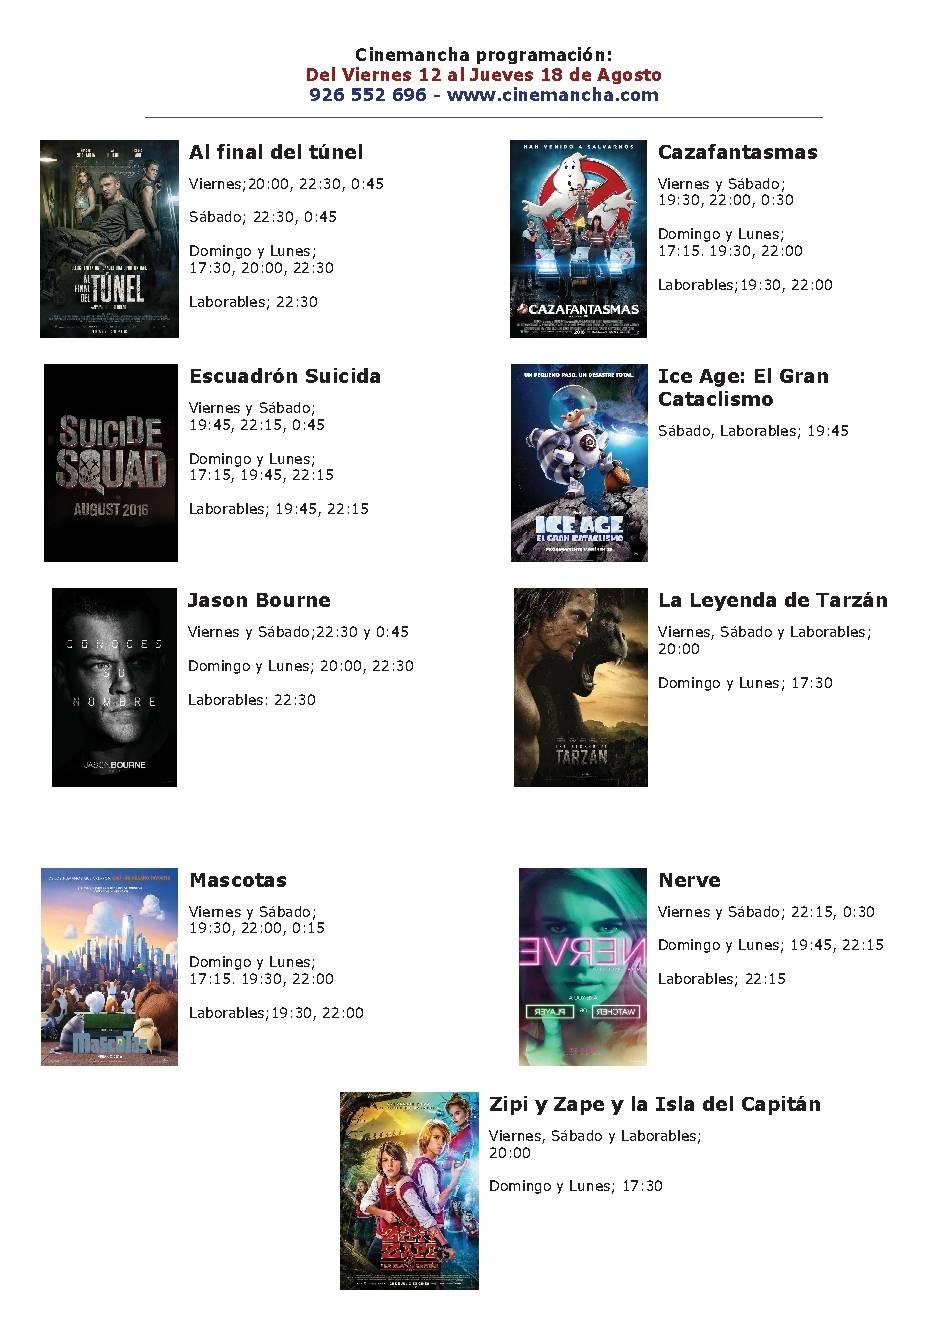 cartelera de cinemancha de la semana del 12 al 18 de agosto - Cartelera Cinemancha del 12 al 18 de agosto